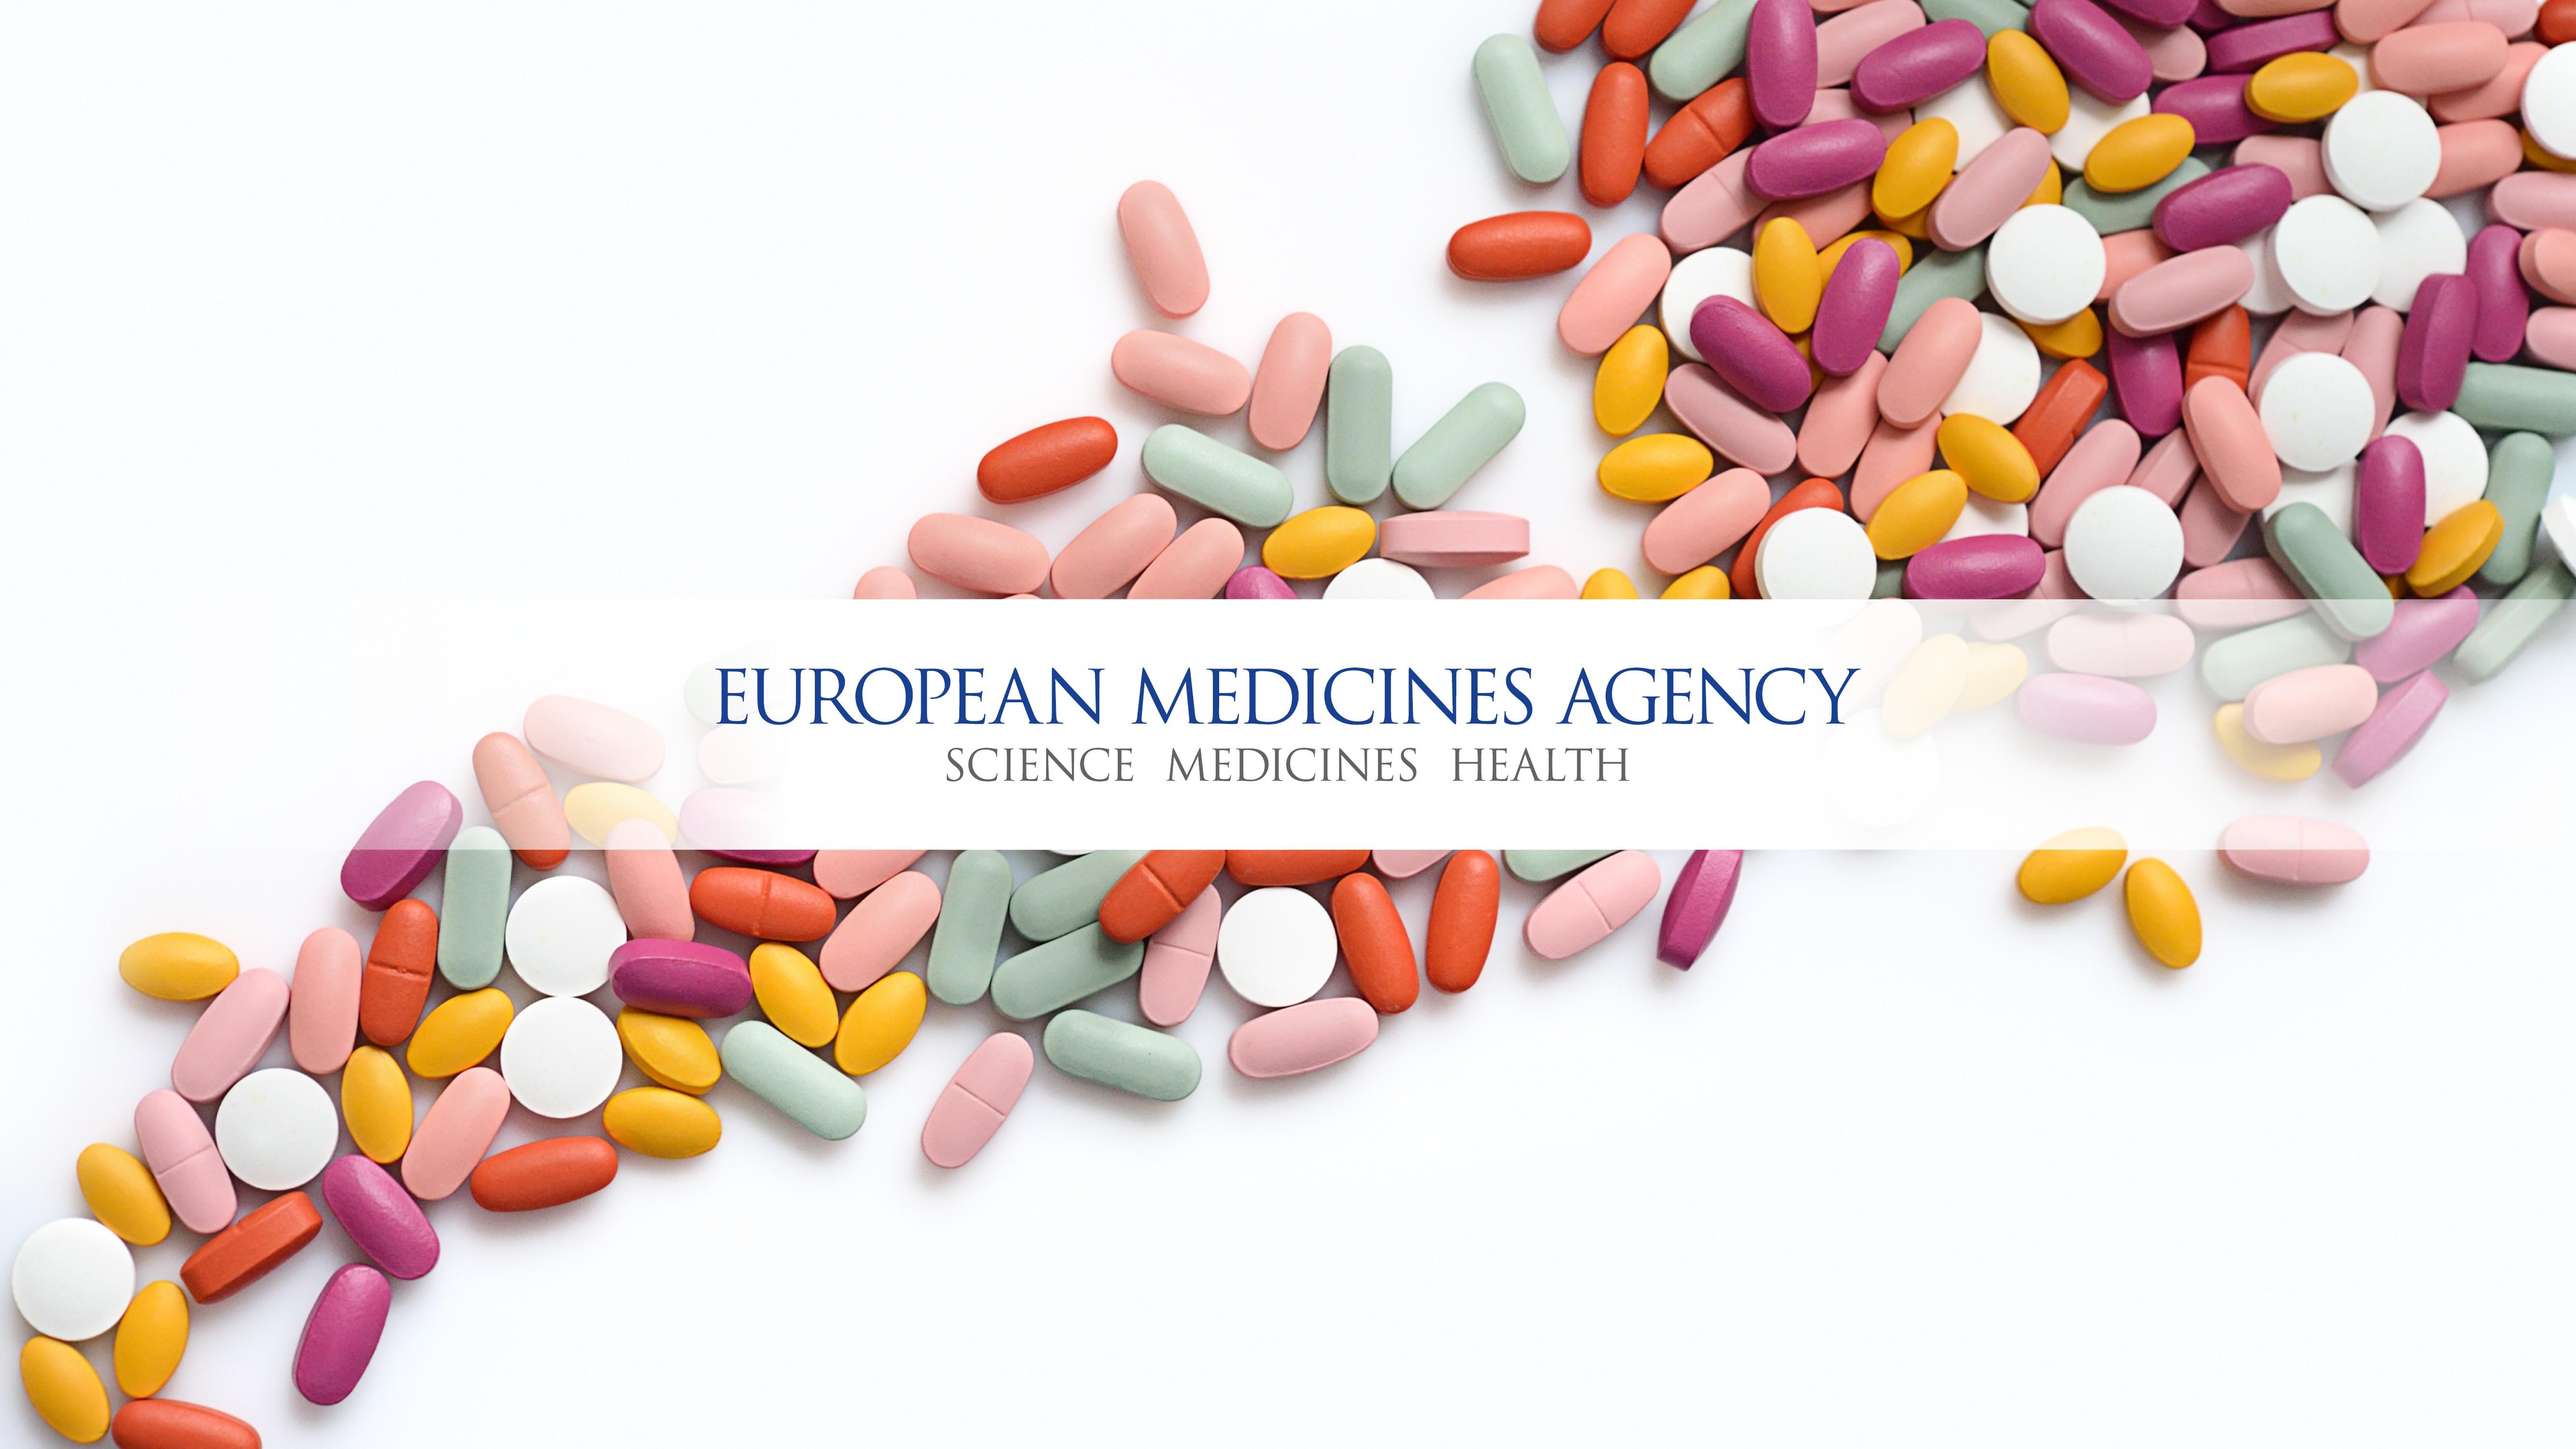 European Medicines Agency | LinkedIn